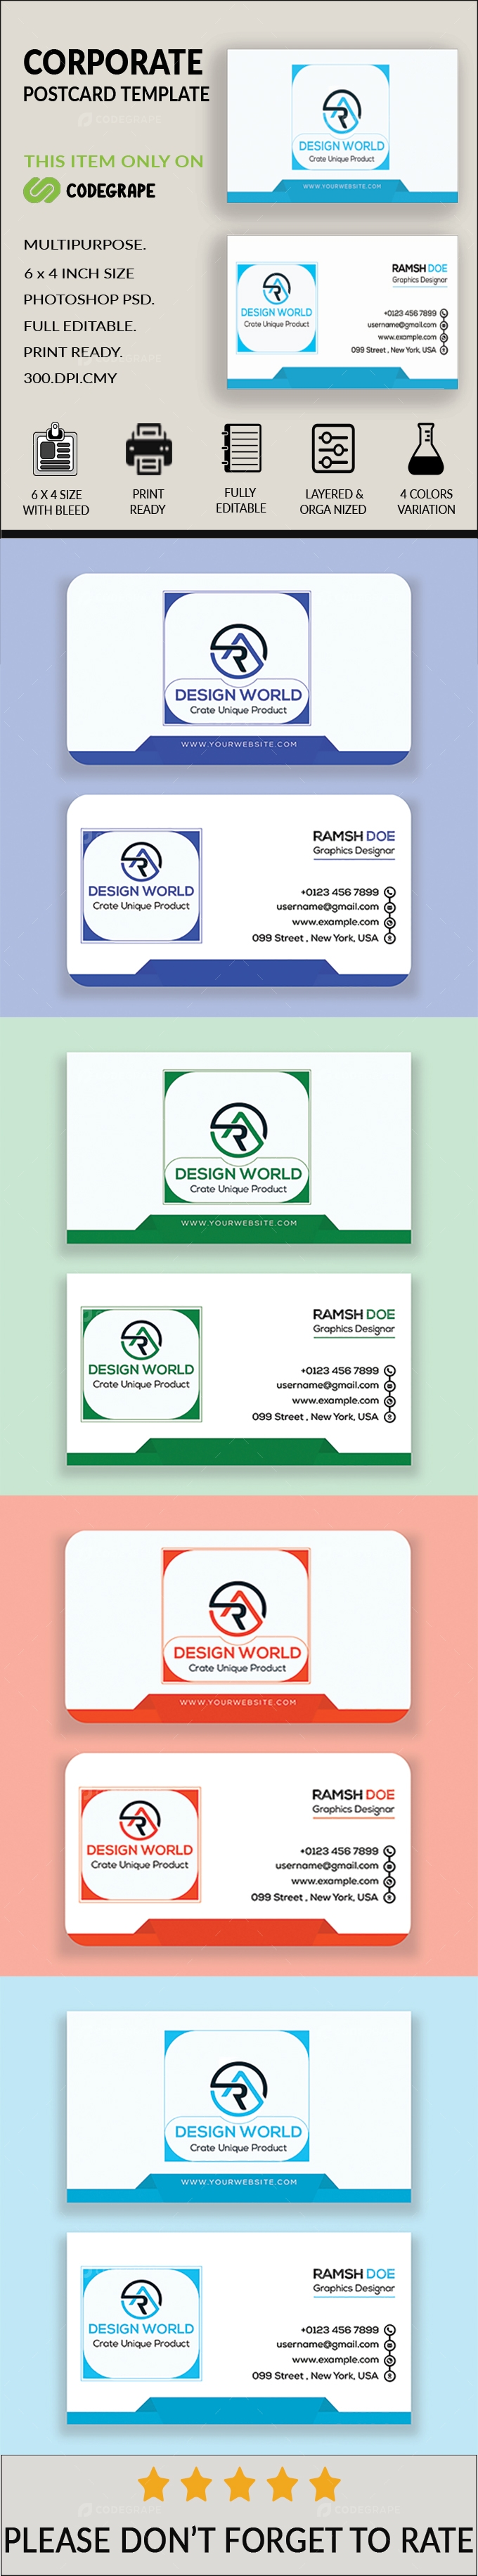 Photoshop Business Card